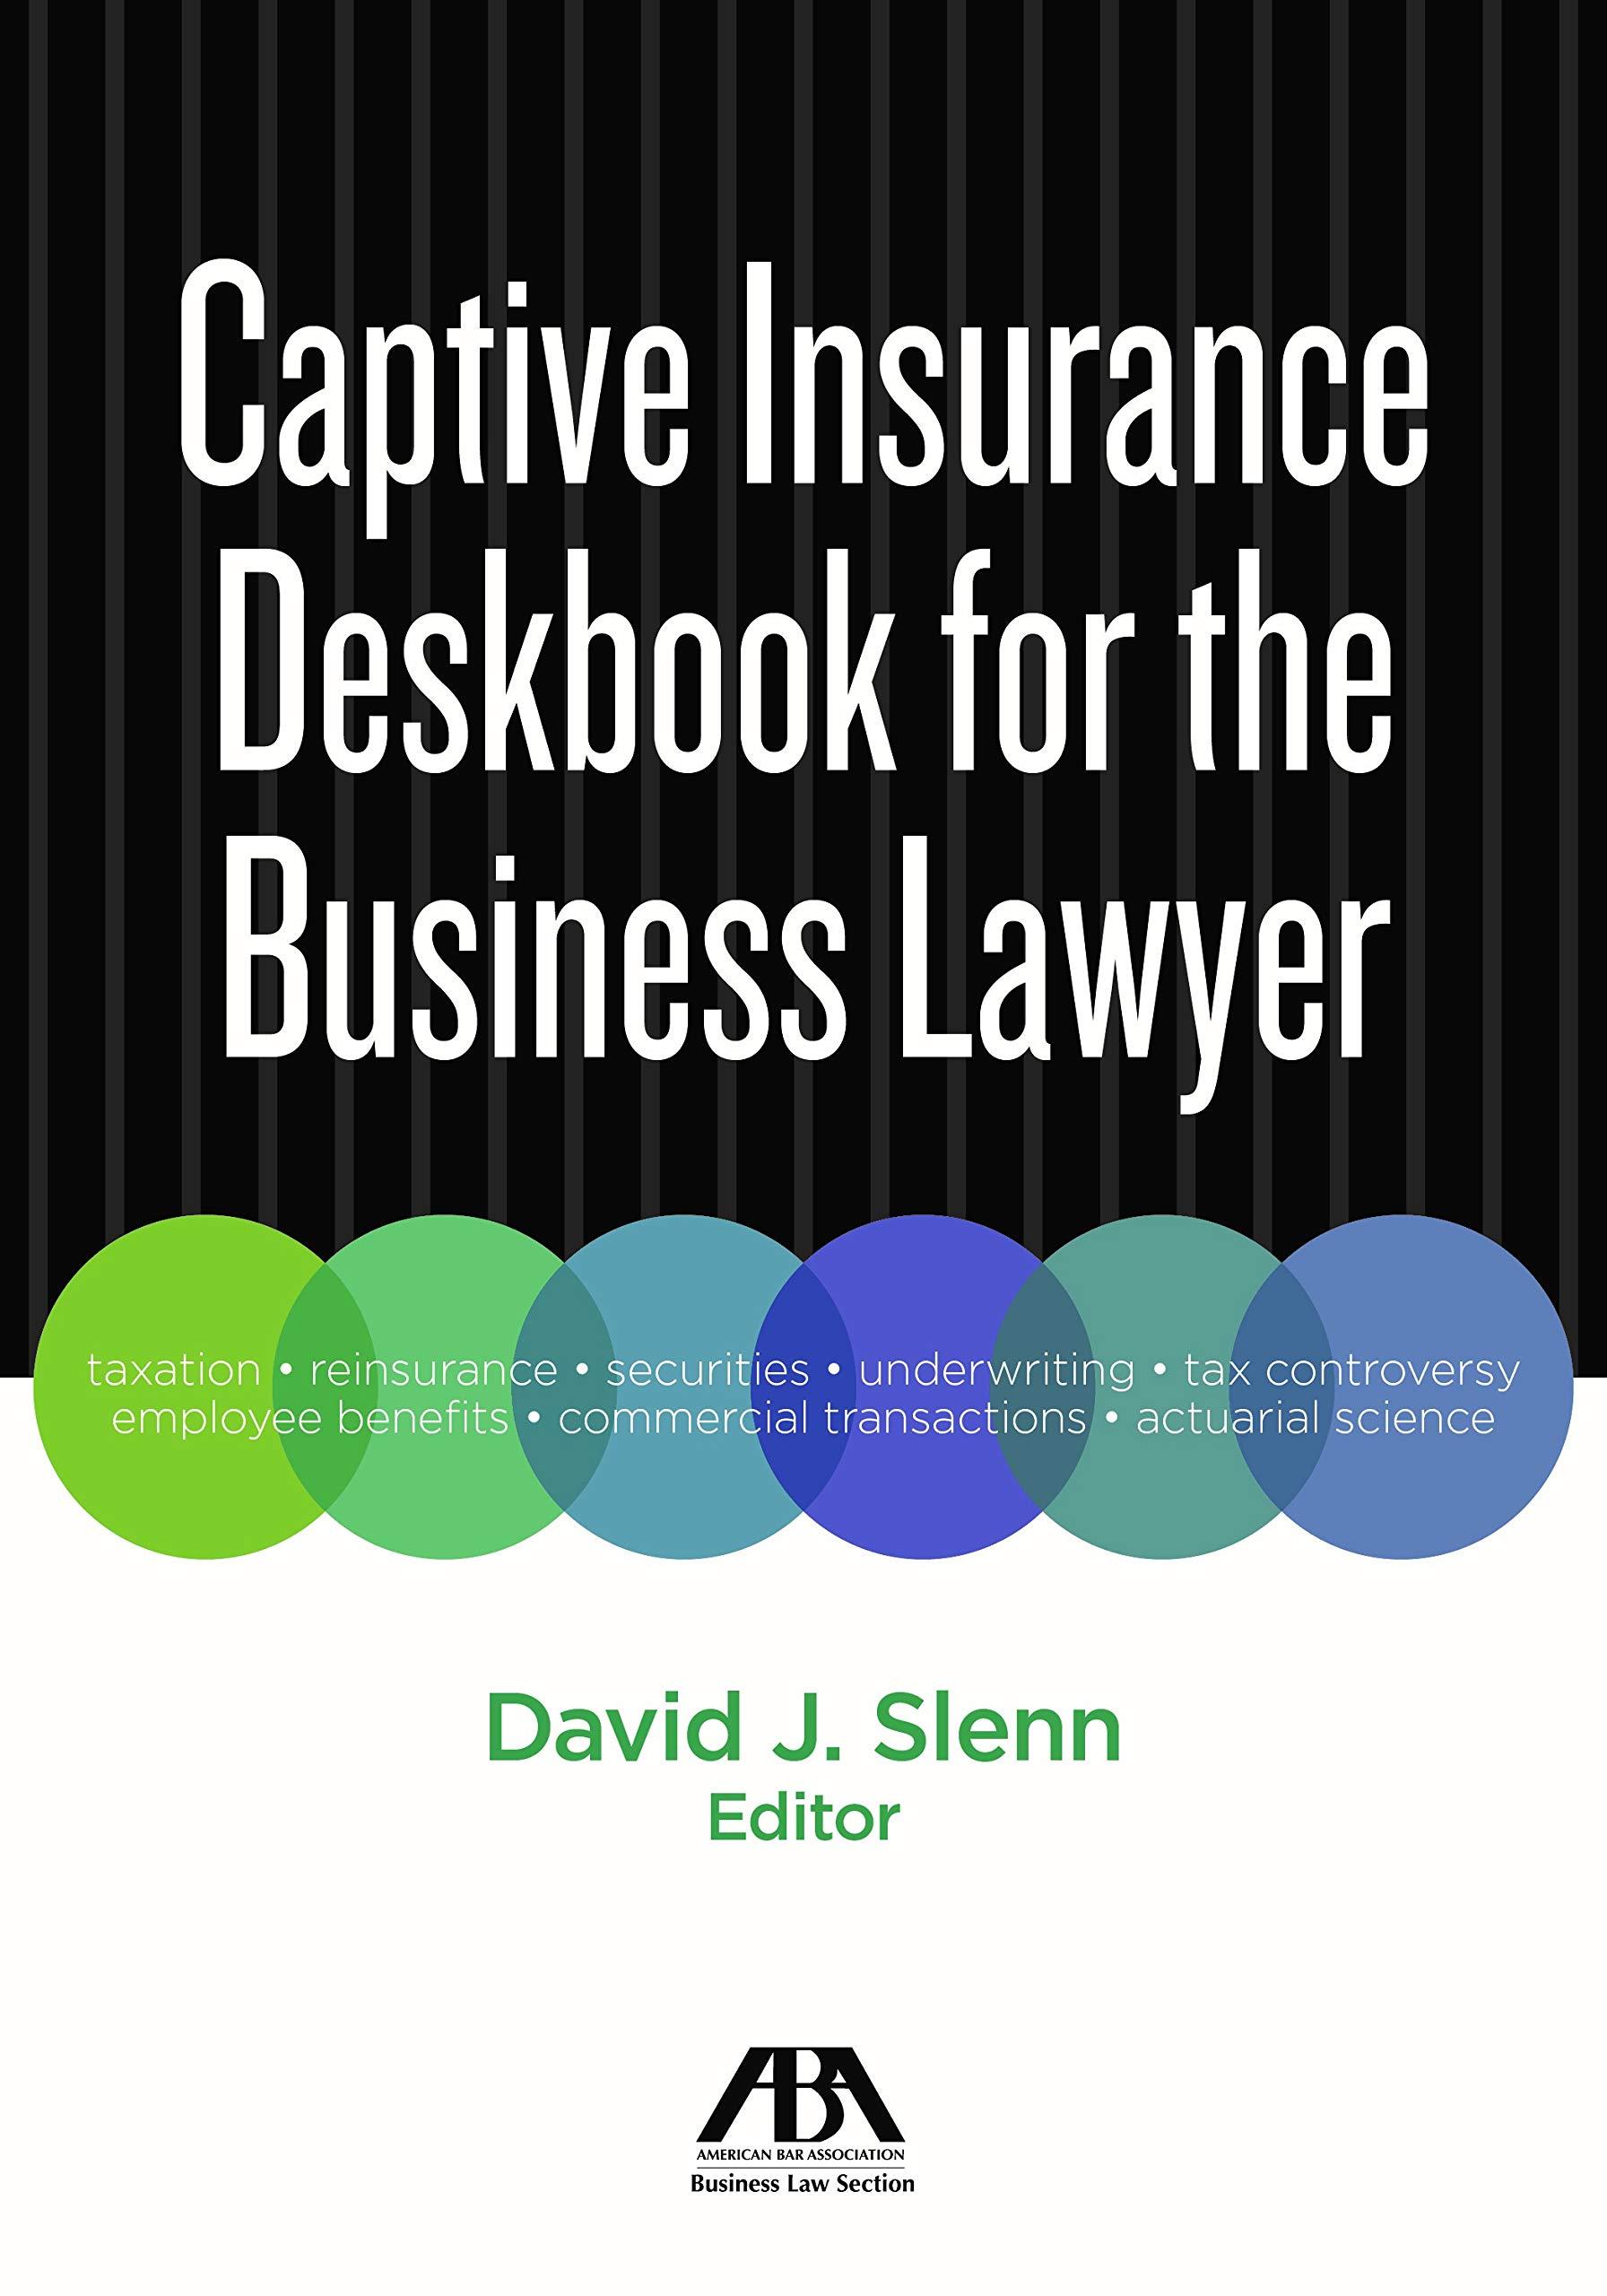 Captive Insurance Deskbook for the Business Lawyer: David J